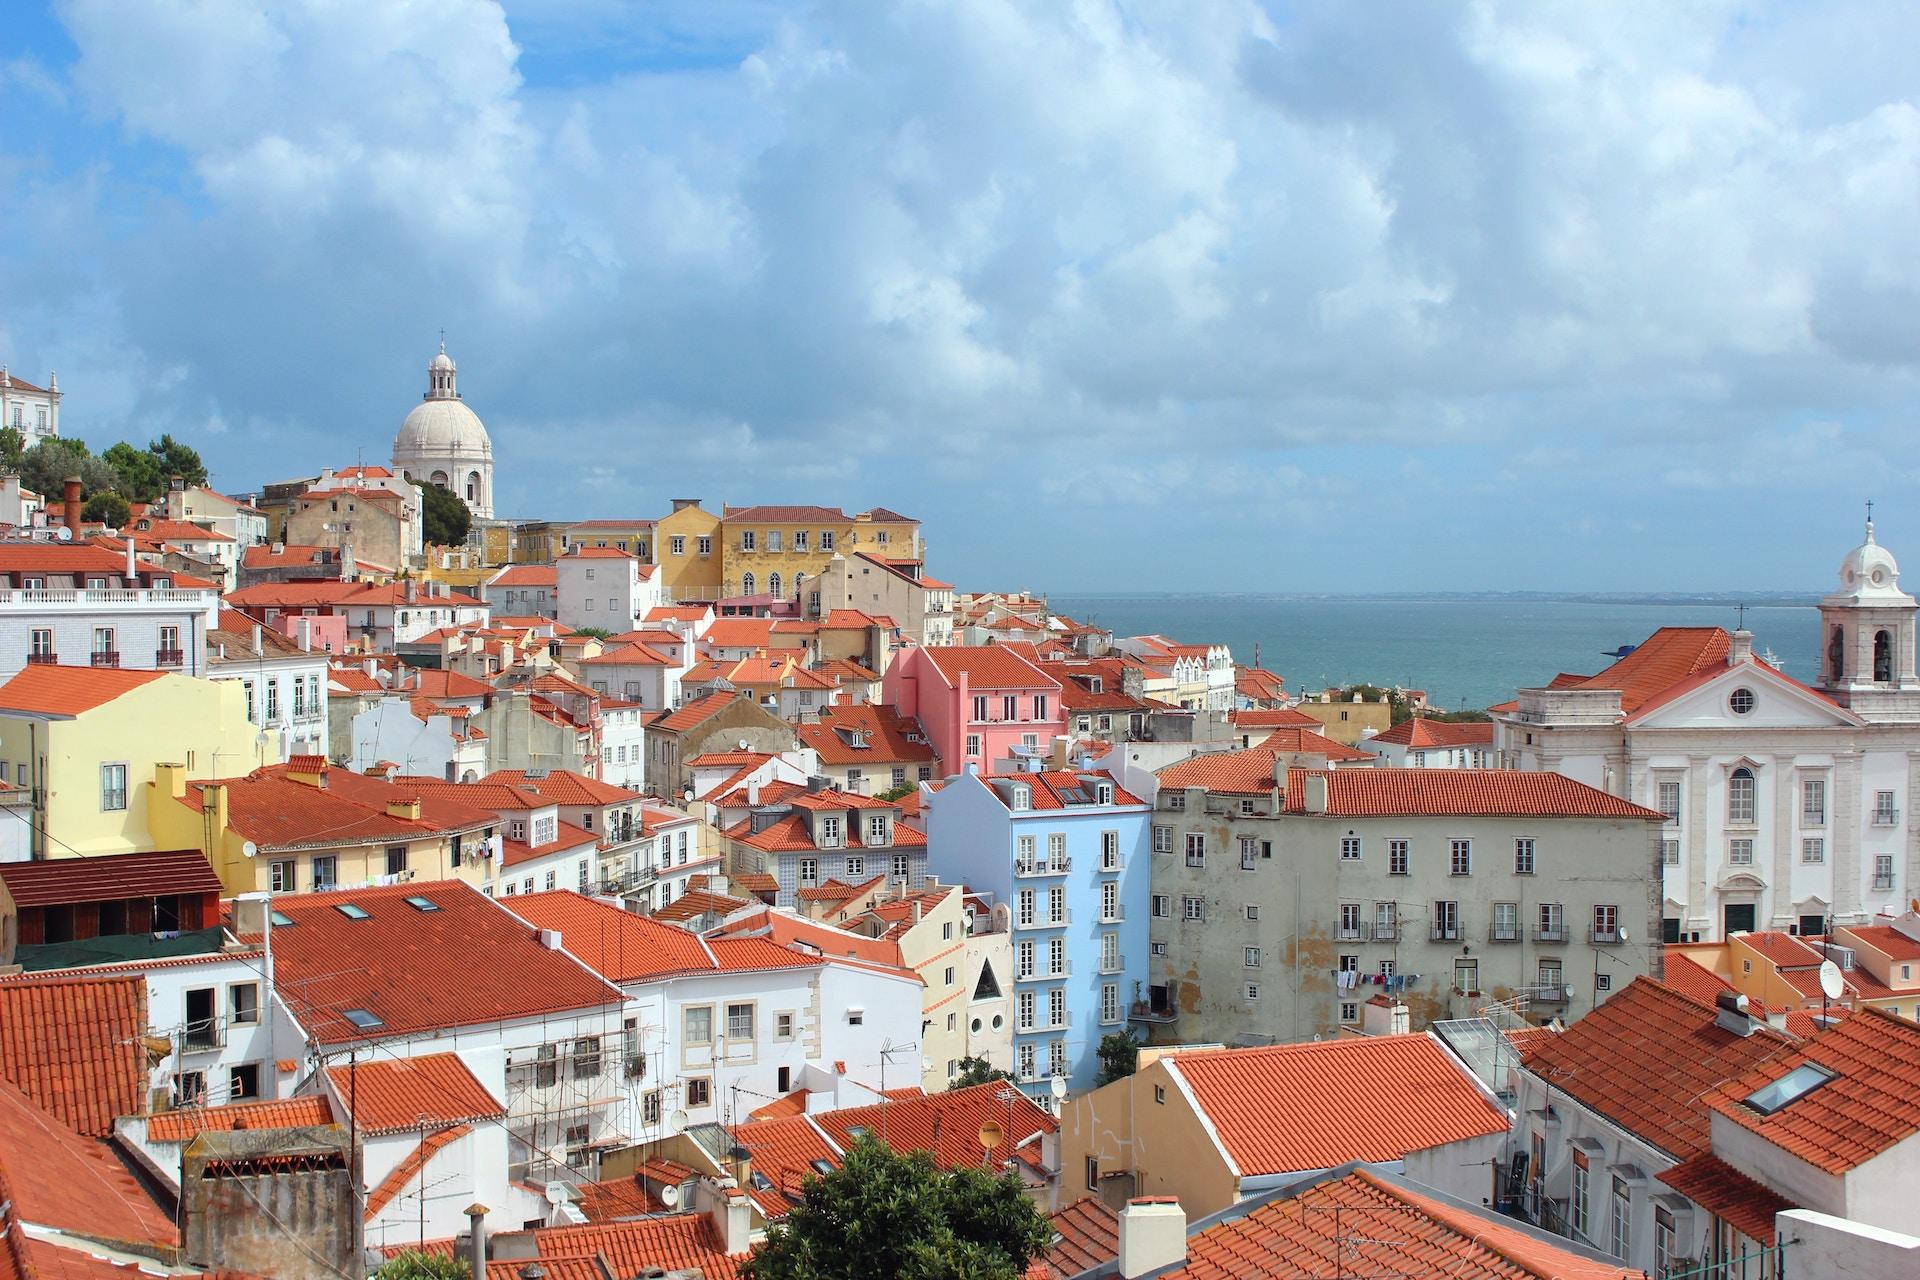 Photo: Lisbon, Portugal; Source: Elisa Michelet, Unsplash